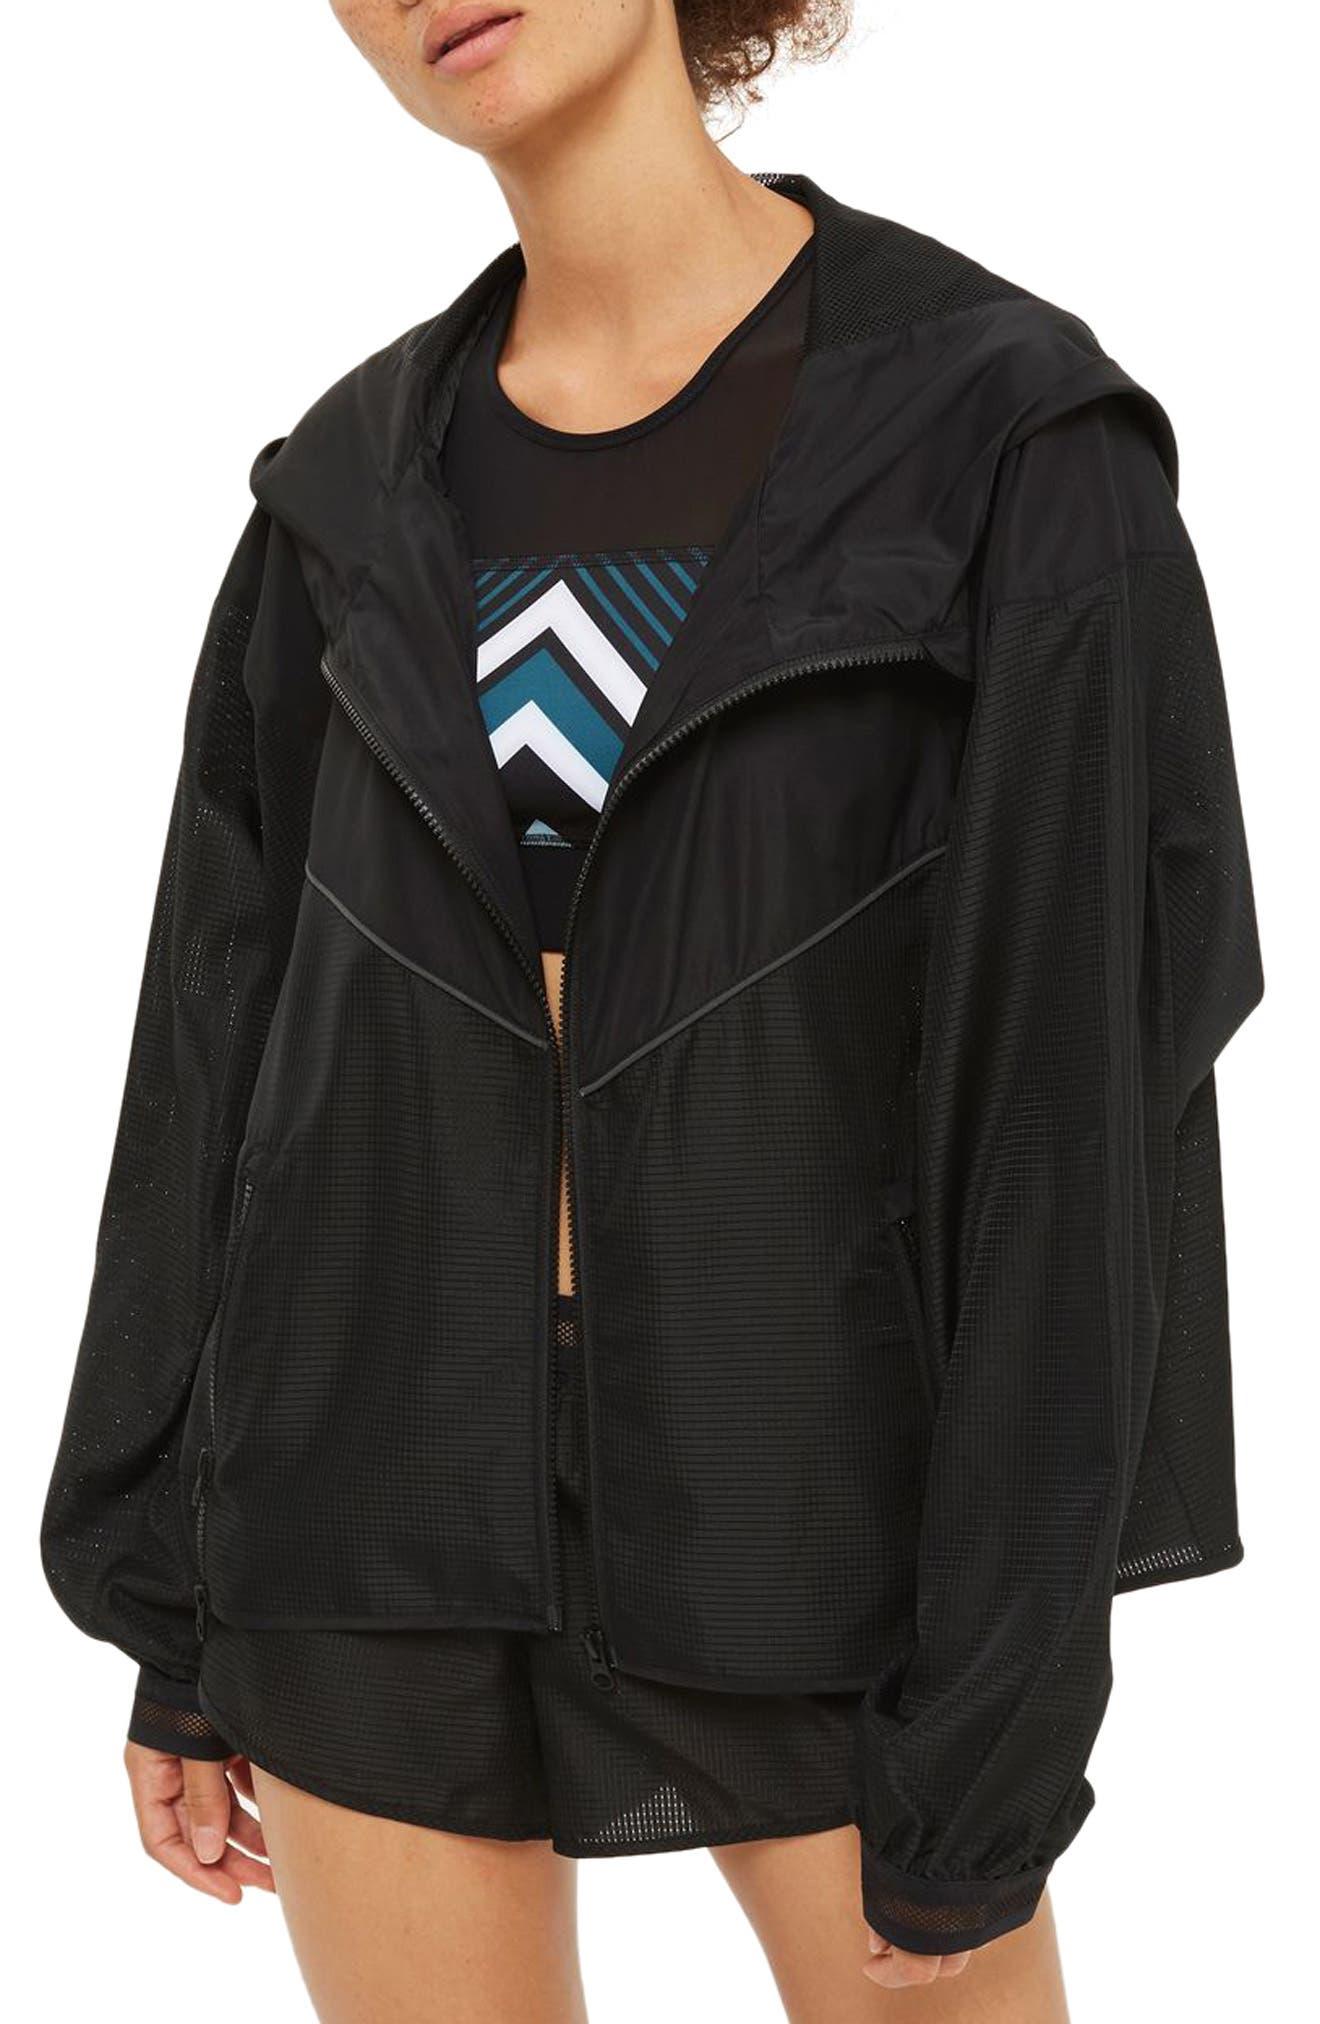 Main Image - IVY PARK® Logo Hood Jacket